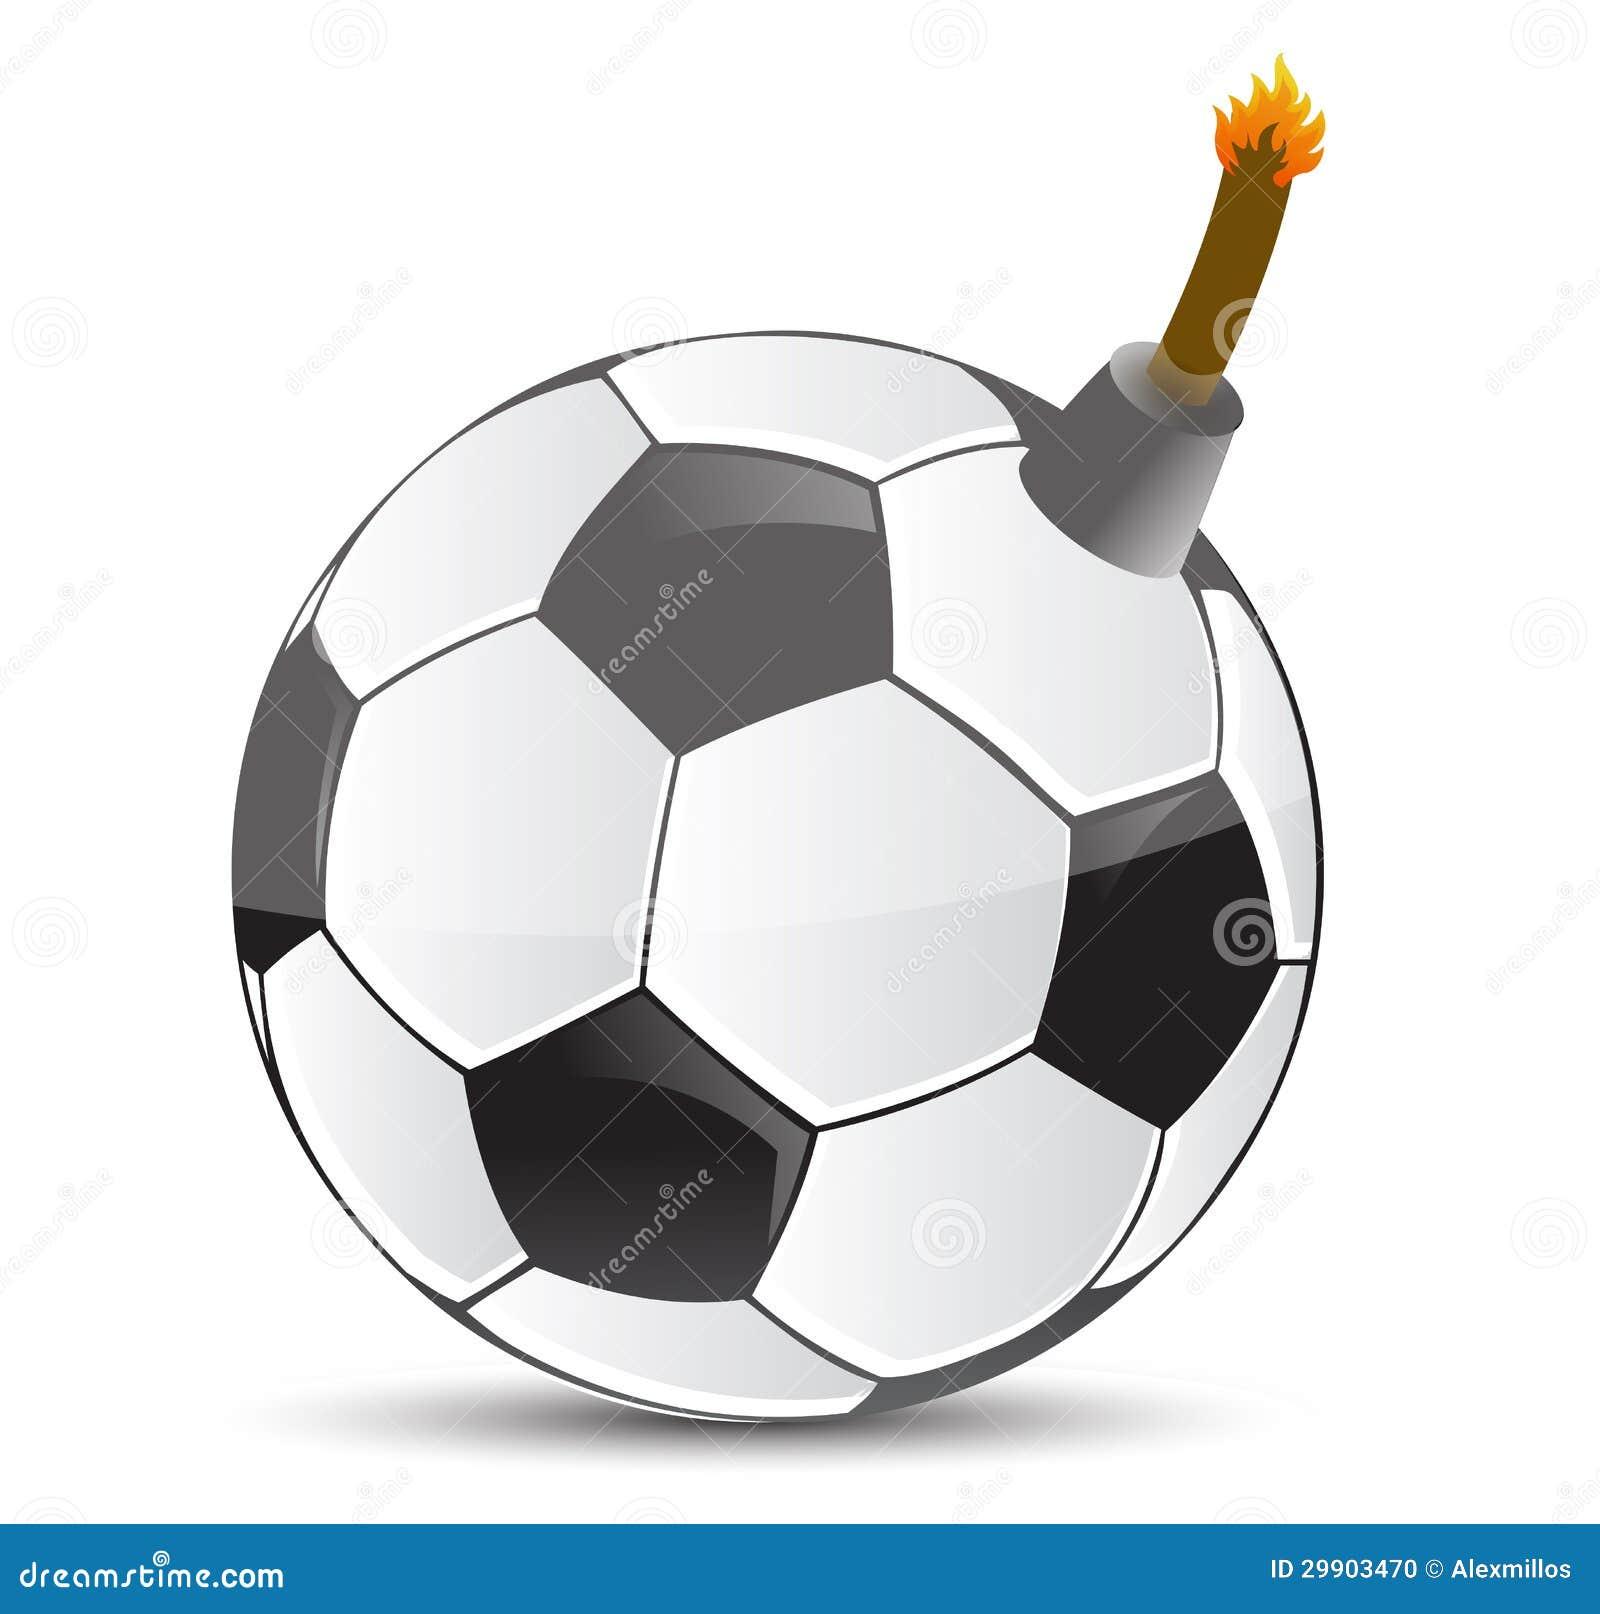 Soccer Bomb Stock Photo - Image: 29903470